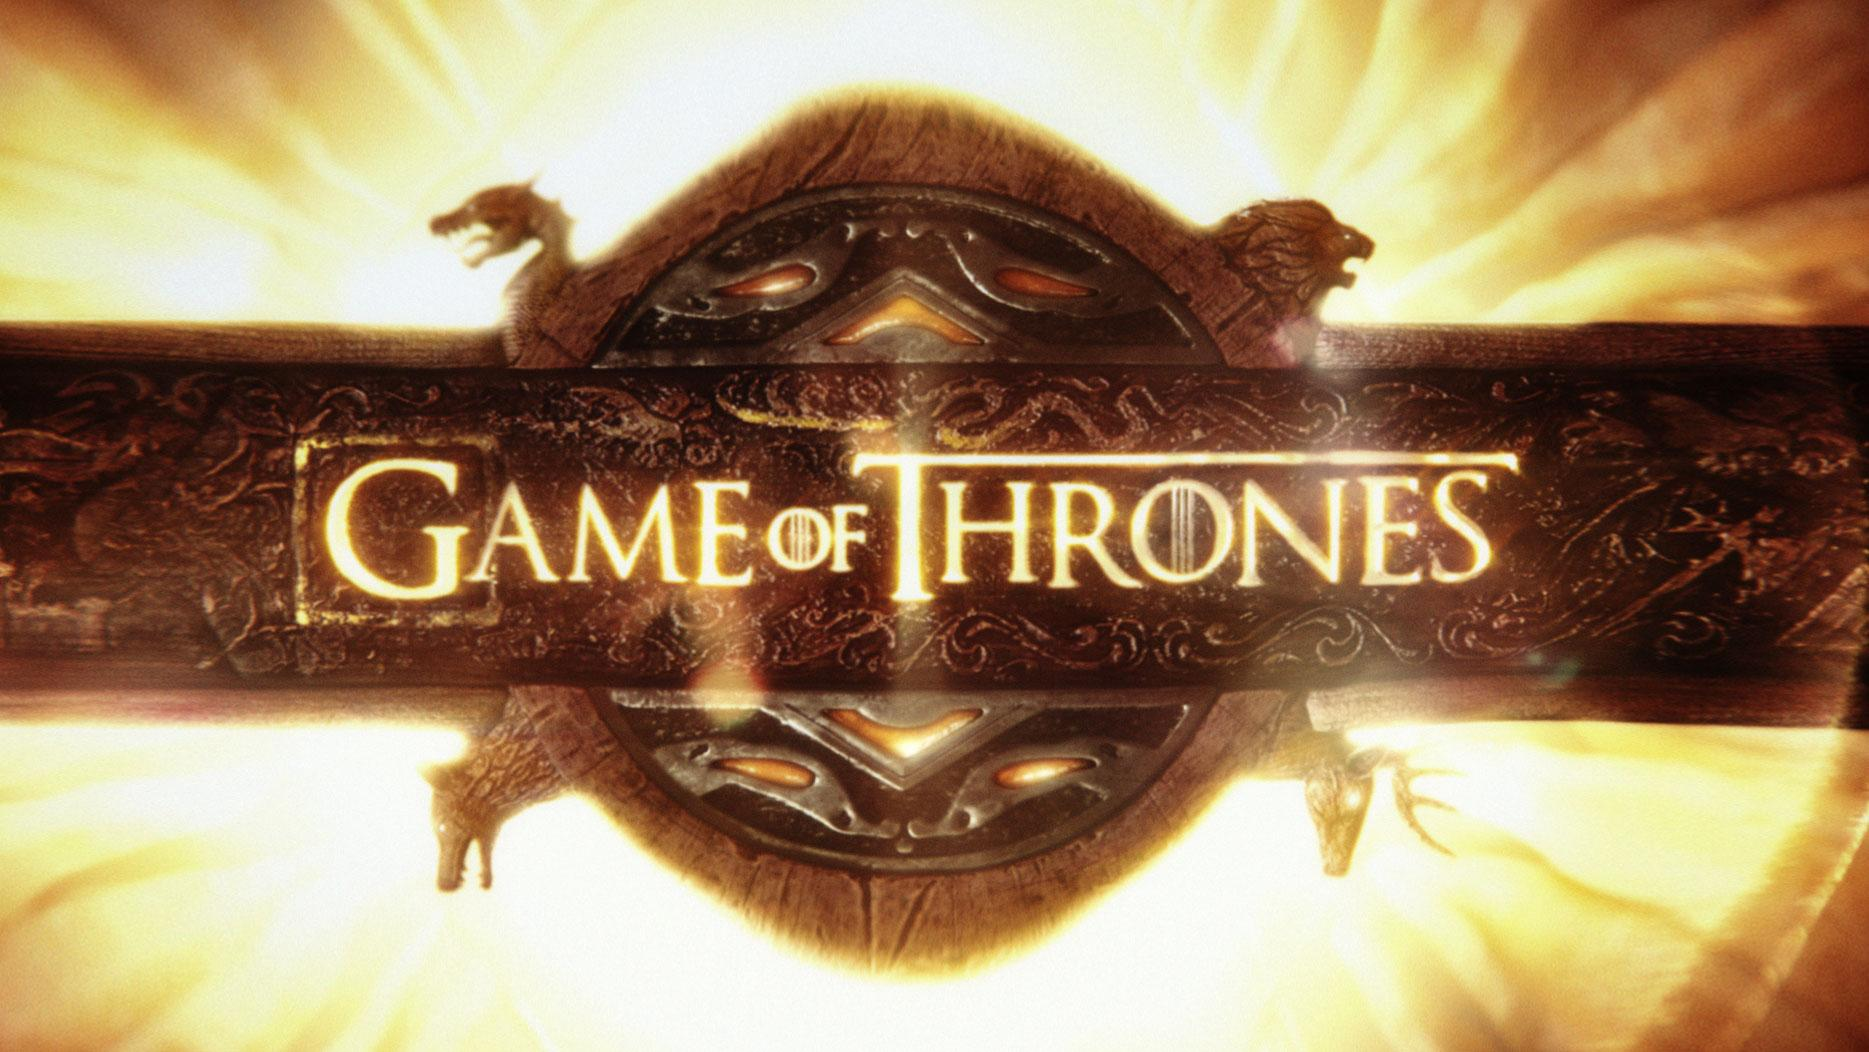 Game of Thrones finale: Spoiler spoilers spoiler in spoiler spoiler